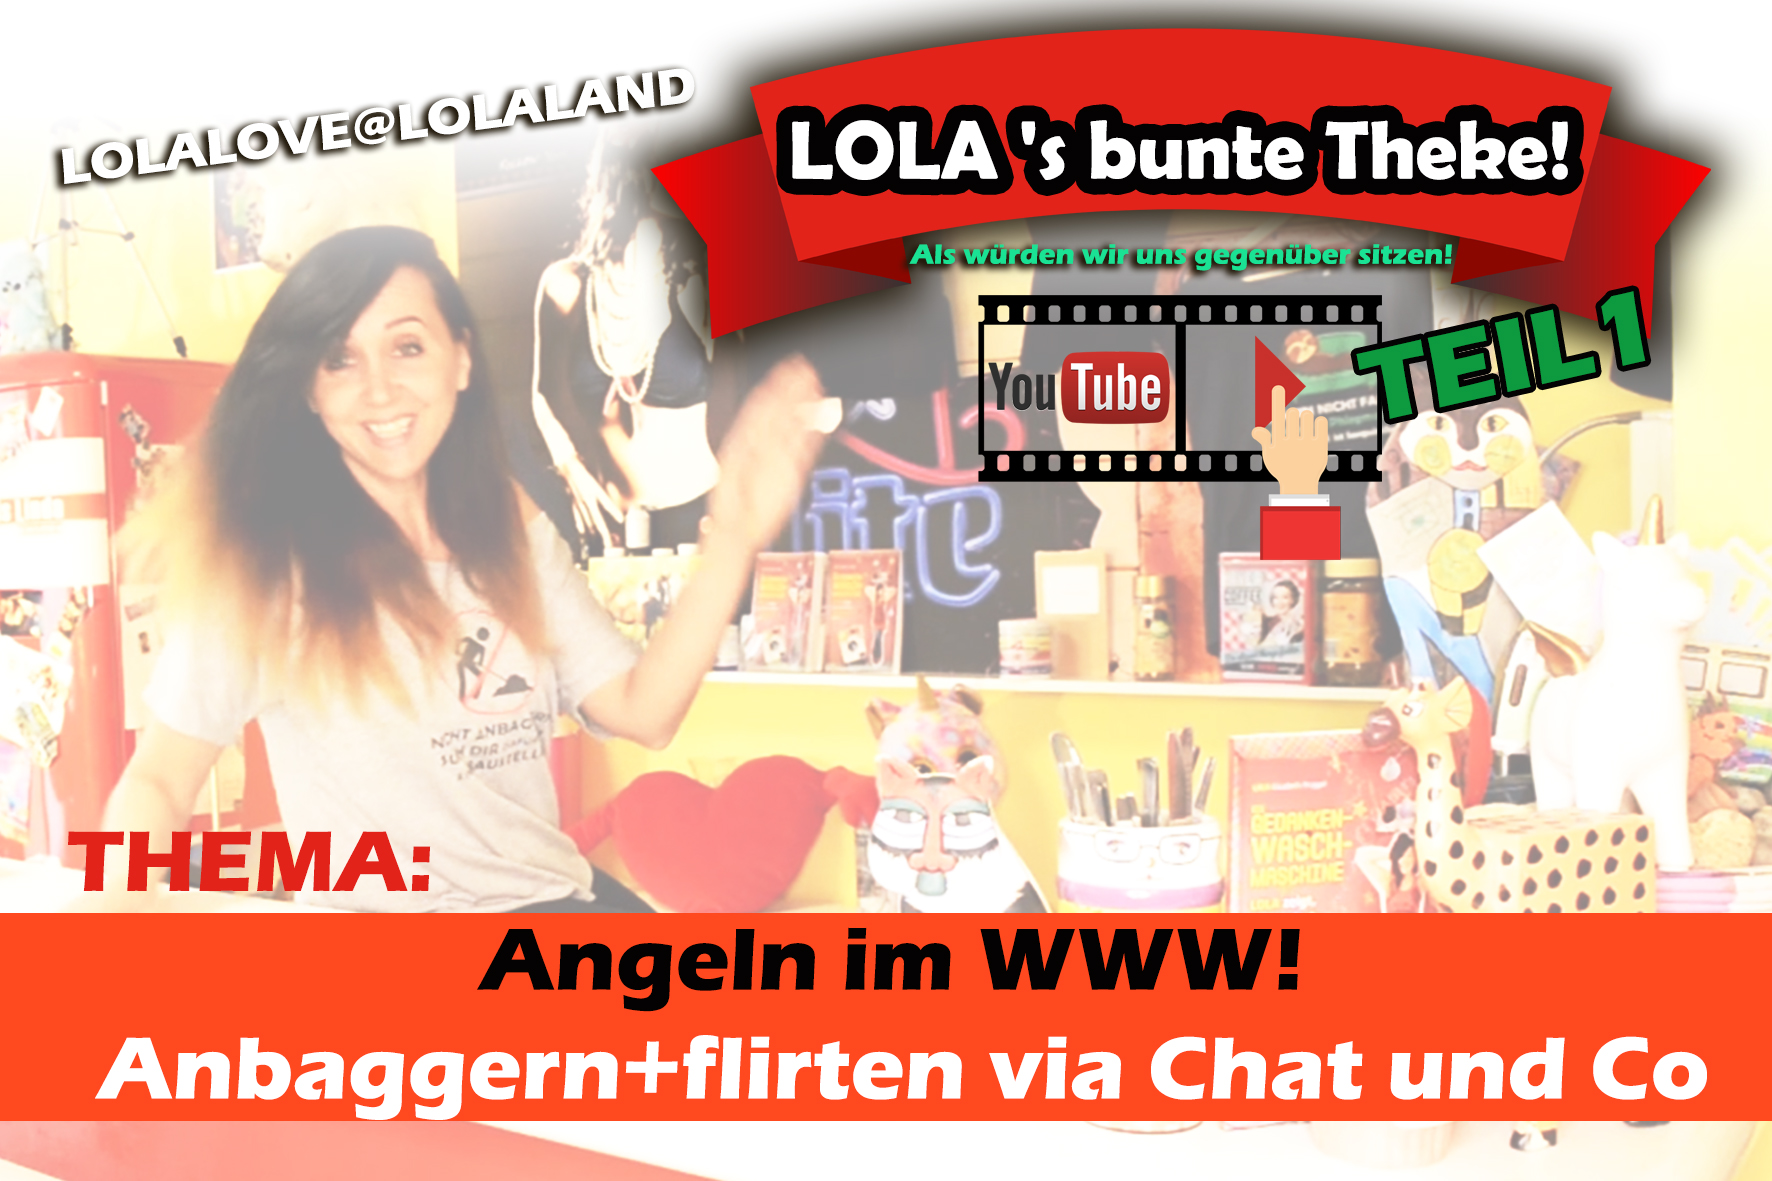 LOLASs bunte Theke,TEIL1, Thema: Angeln im WWW! Flirten via Chat!